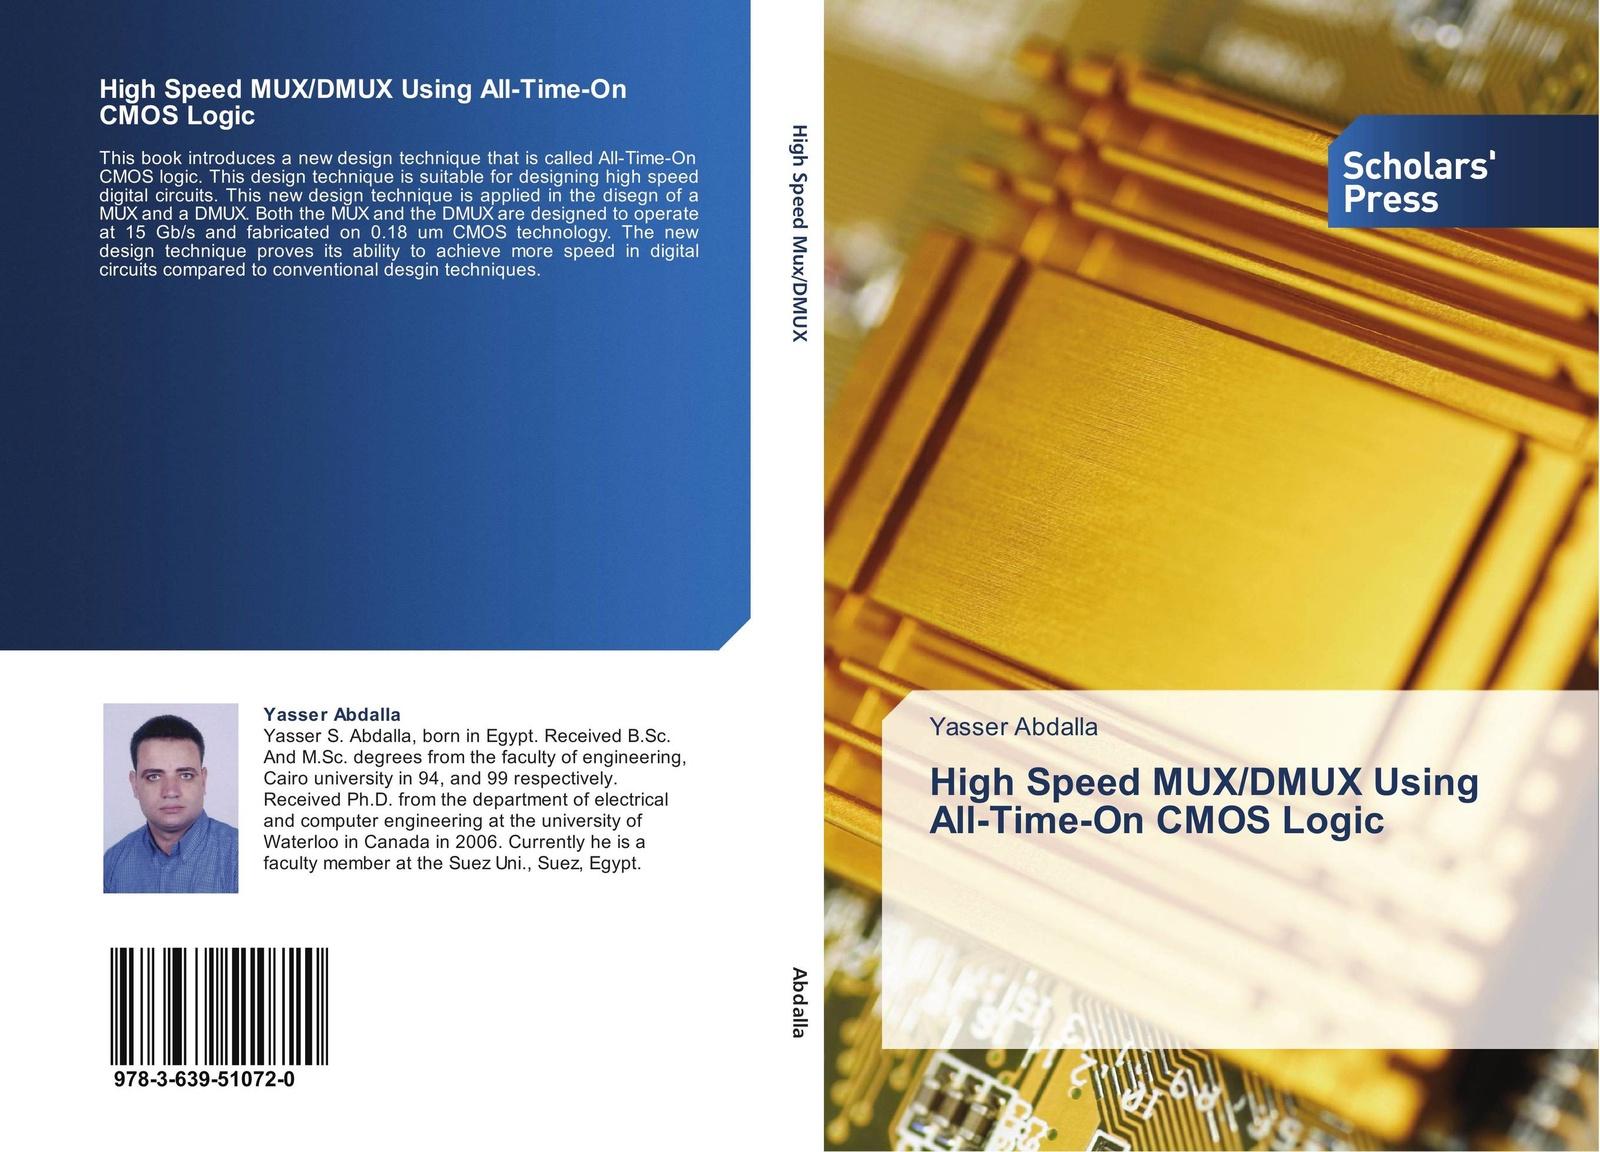 Yasser Abdalla High Speed MUX/DMUX Using All-Time-On CMOS Logic 100% tested good working high quality for original 460wsc4lv0 1 lt4619 lta460ws l03 logic board 98% new